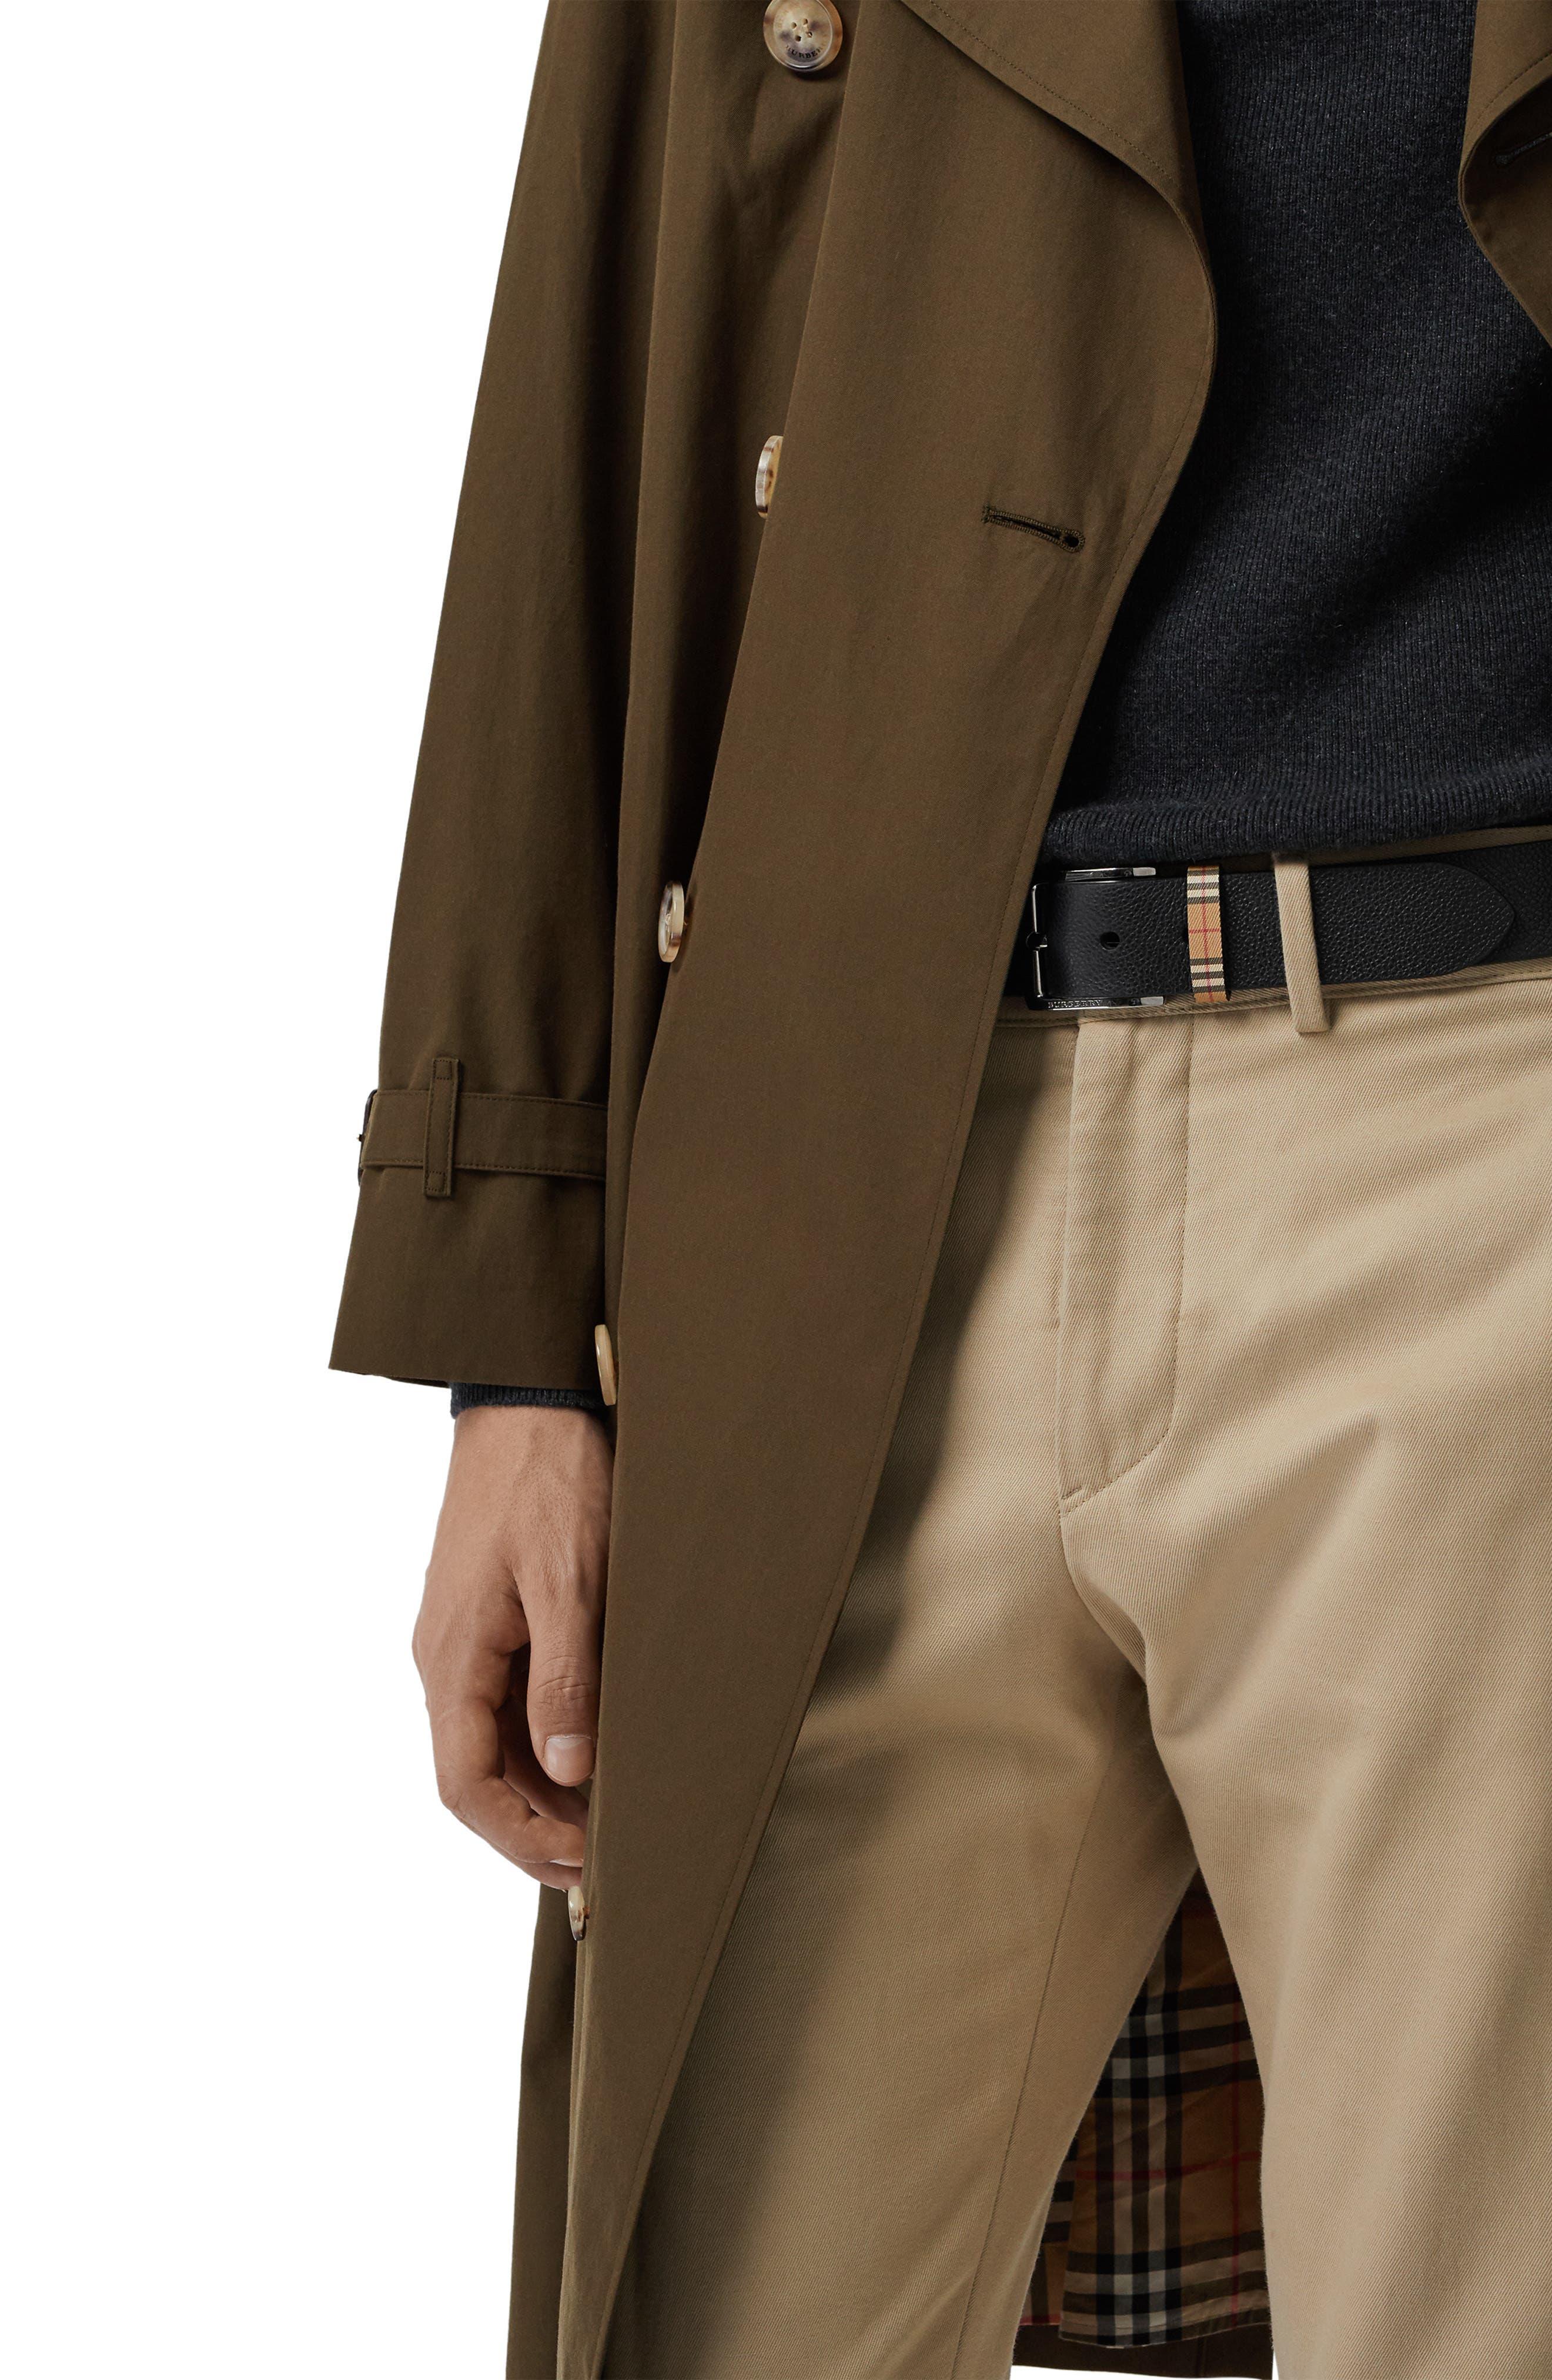 BURBERRY,                             Grainy Leather Belt,                             Alternate thumbnail 2, color,                             BLACK